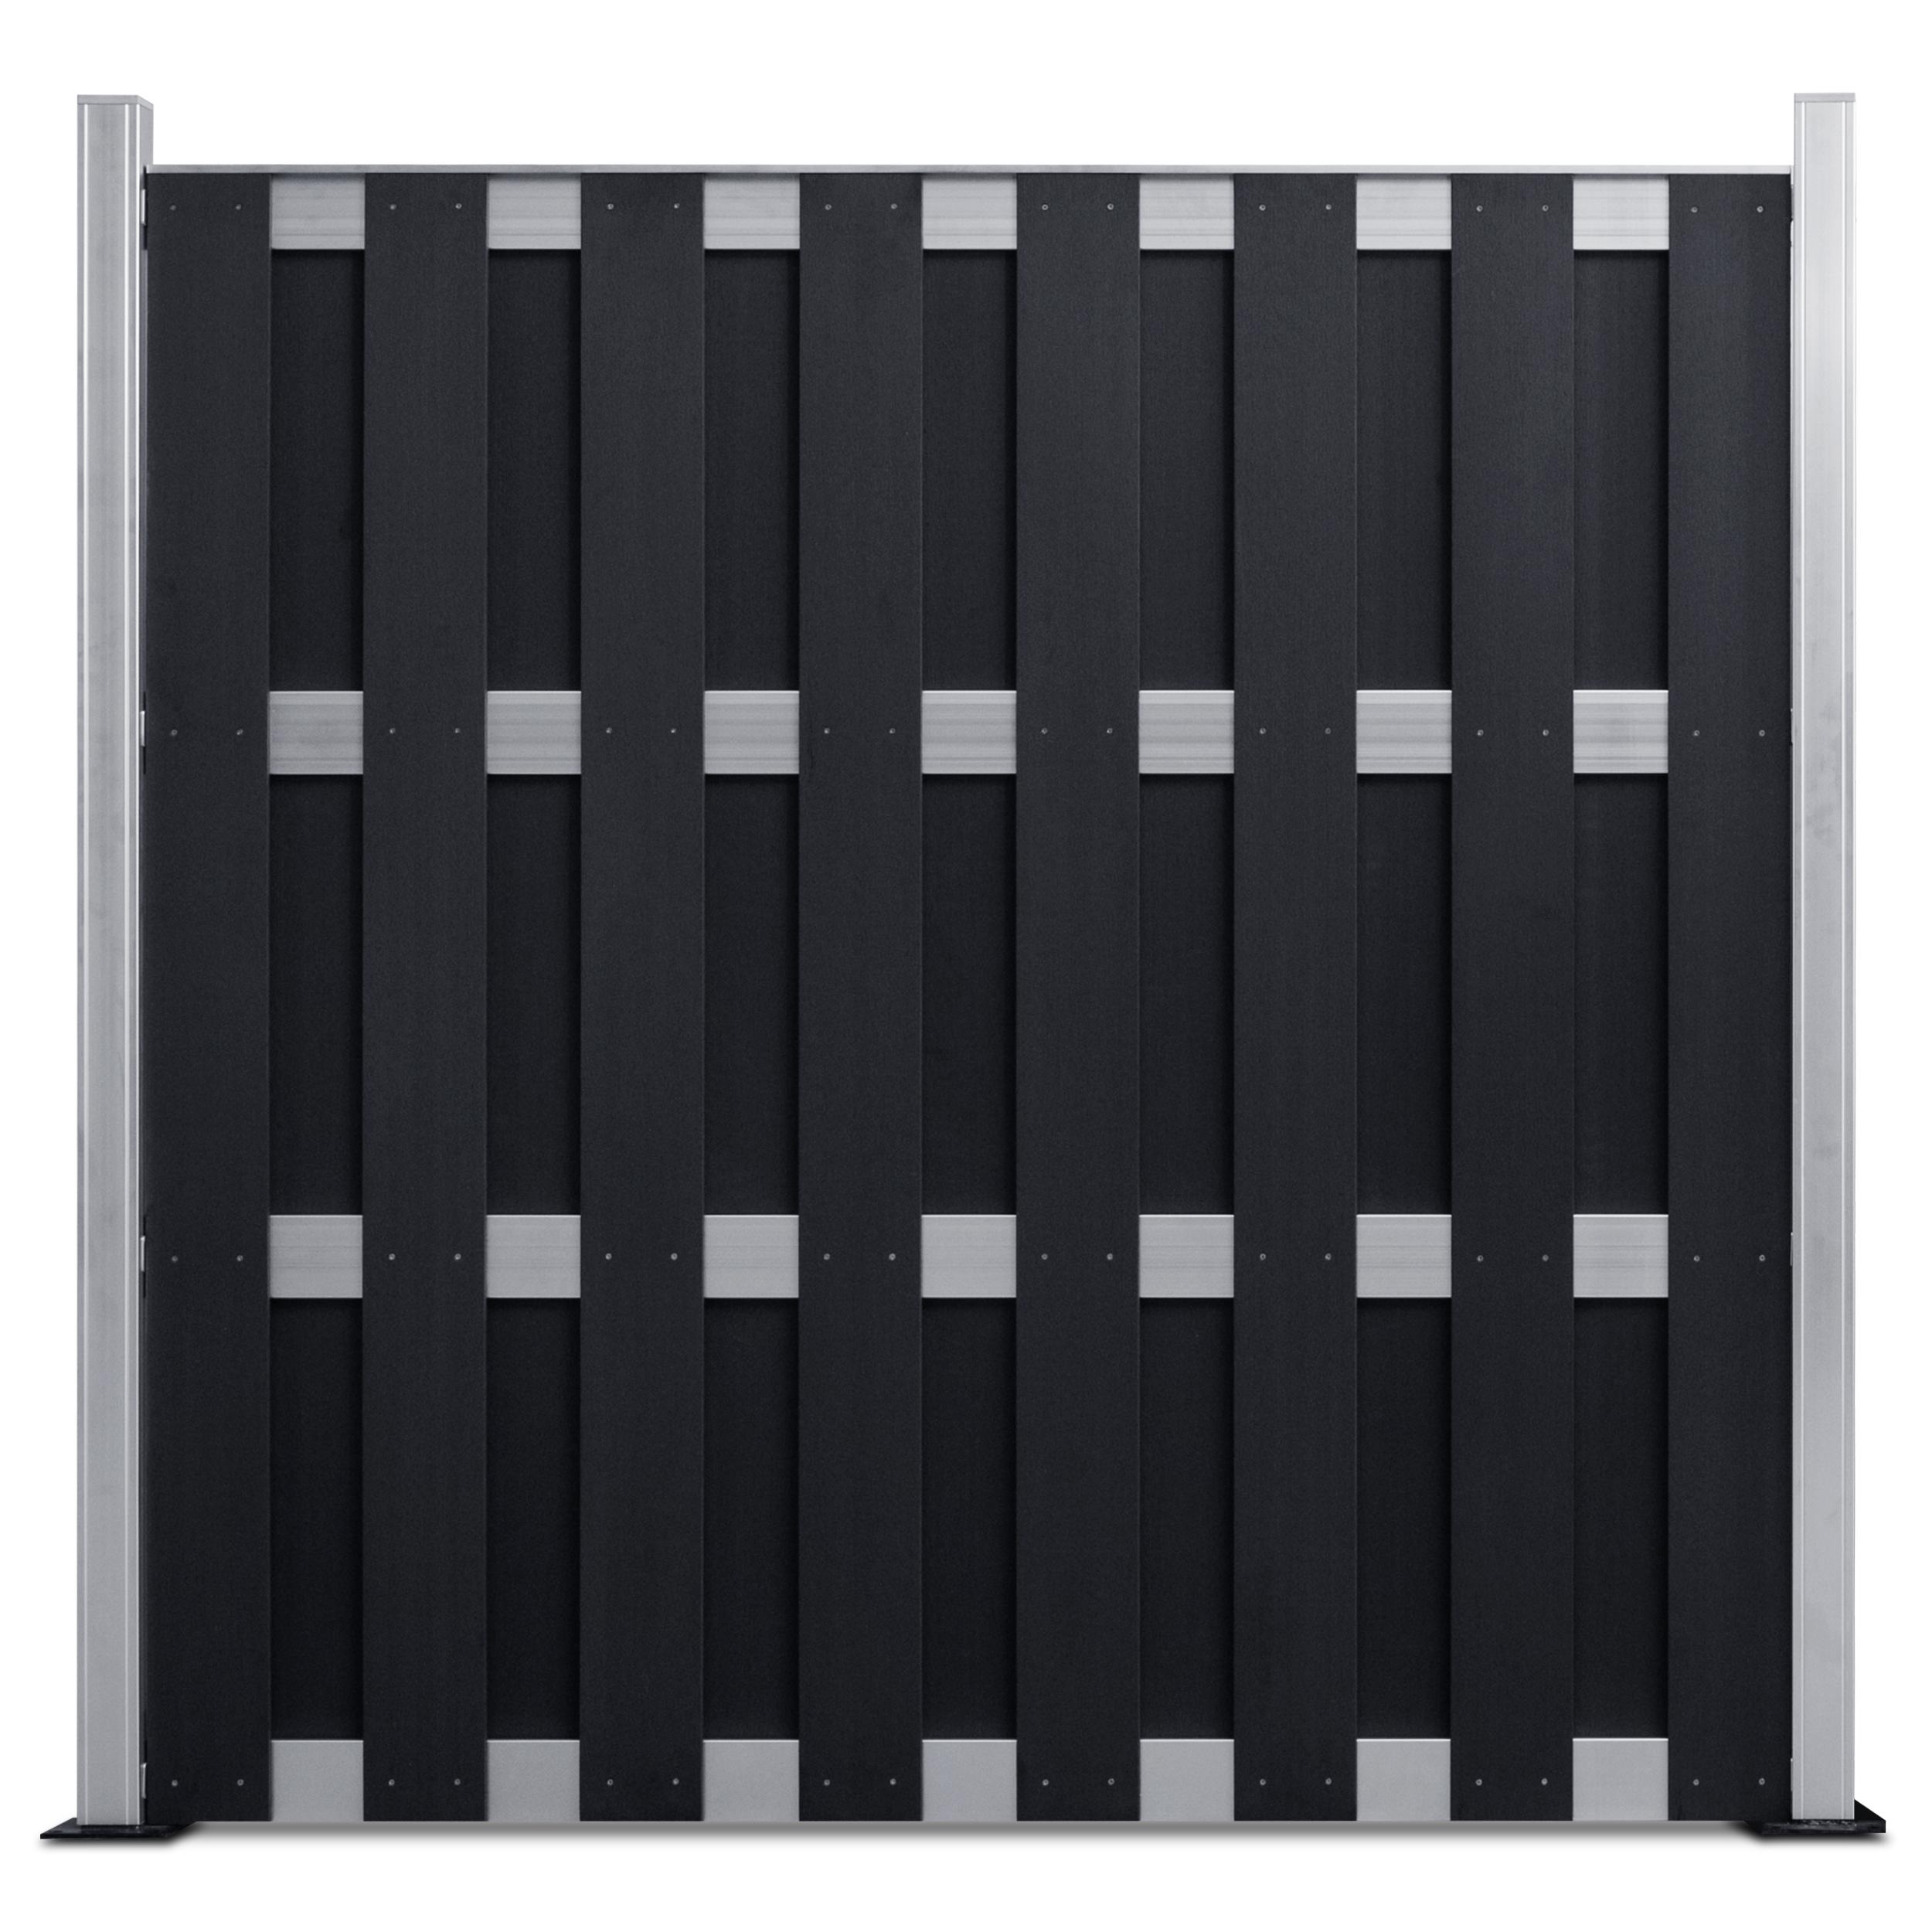 wpc sichtschutzzaun classic line komplettbausatz anthrazit silber. Black Bedroom Furniture Sets. Home Design Ideas